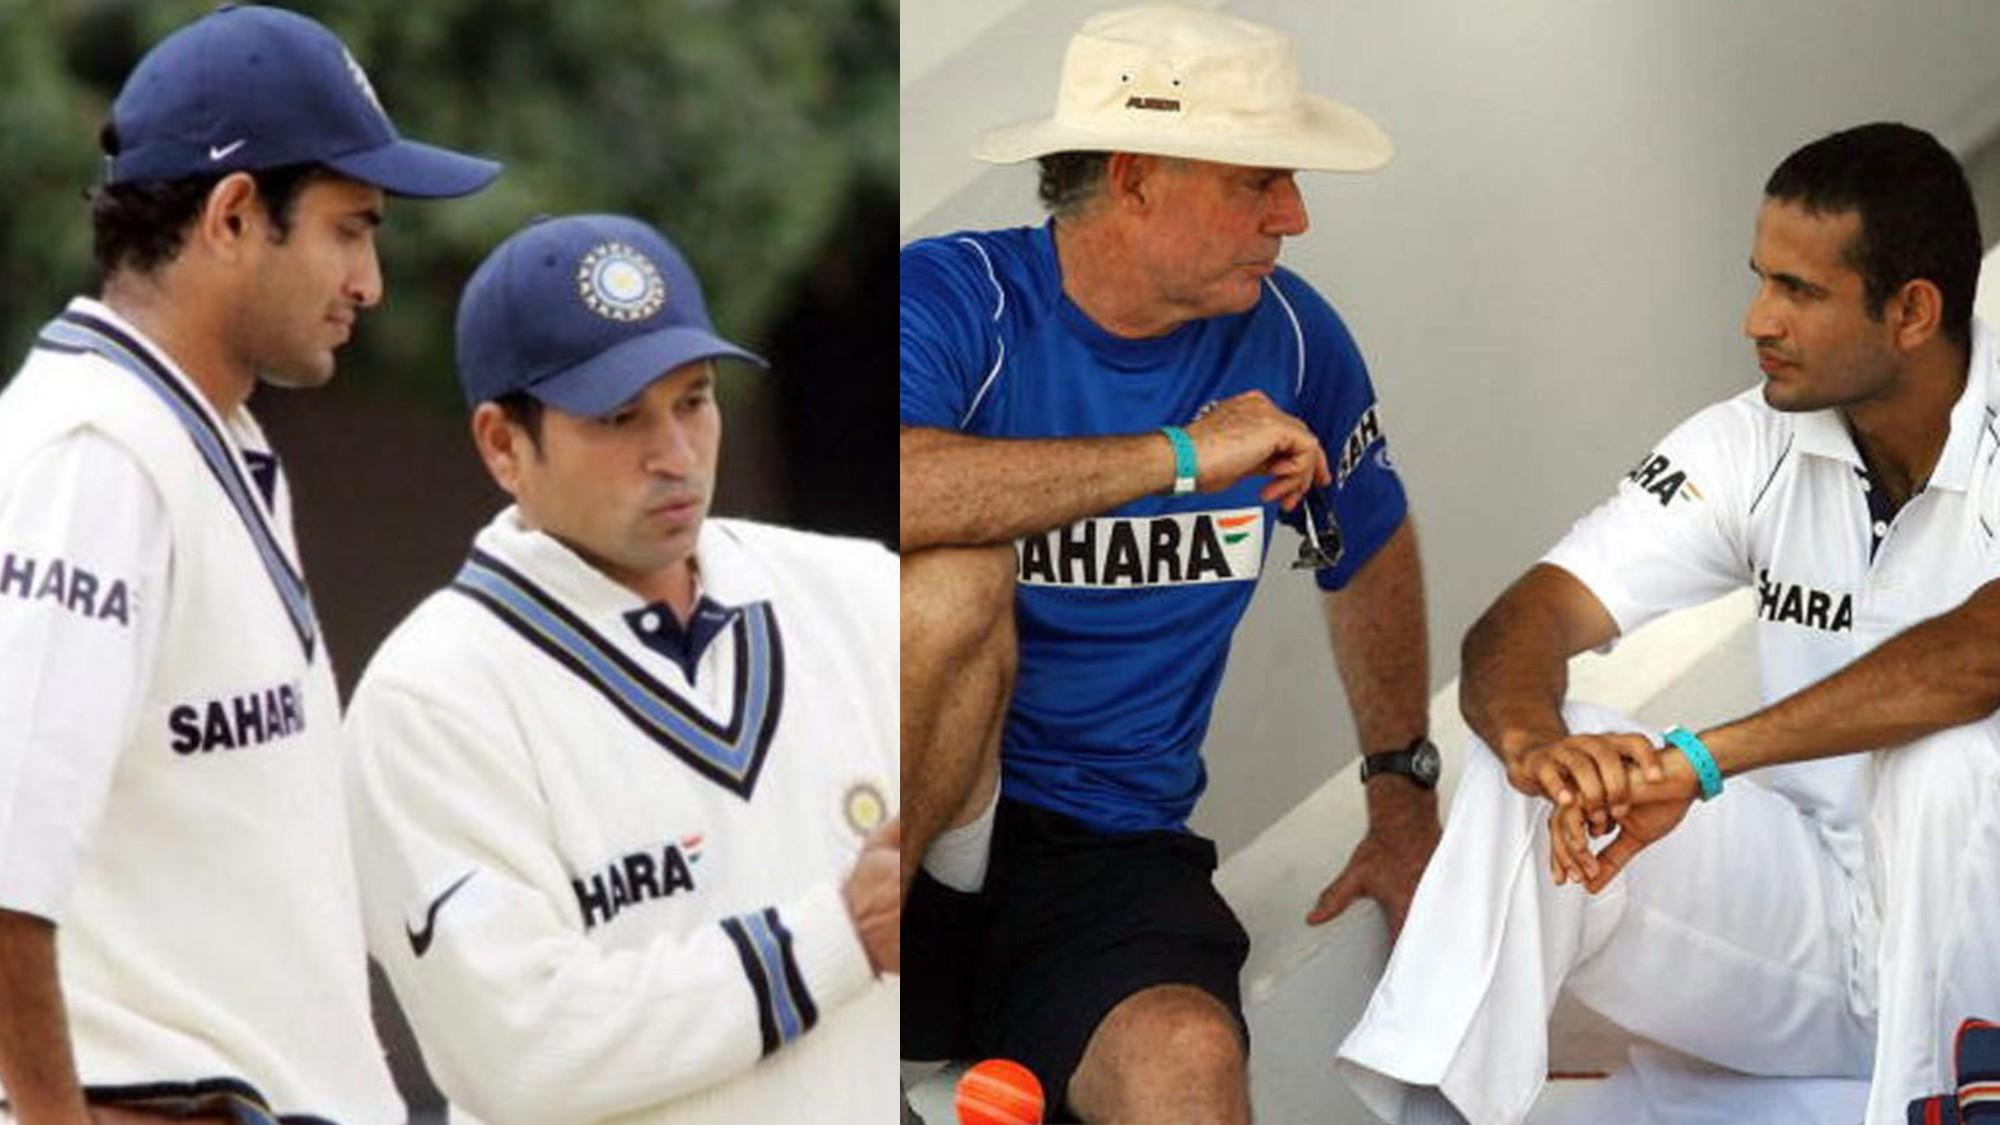 Irfan Pathan reveals it was Sachin Tendulkar's idea for him to bat at no.3, not Greg Chappell's